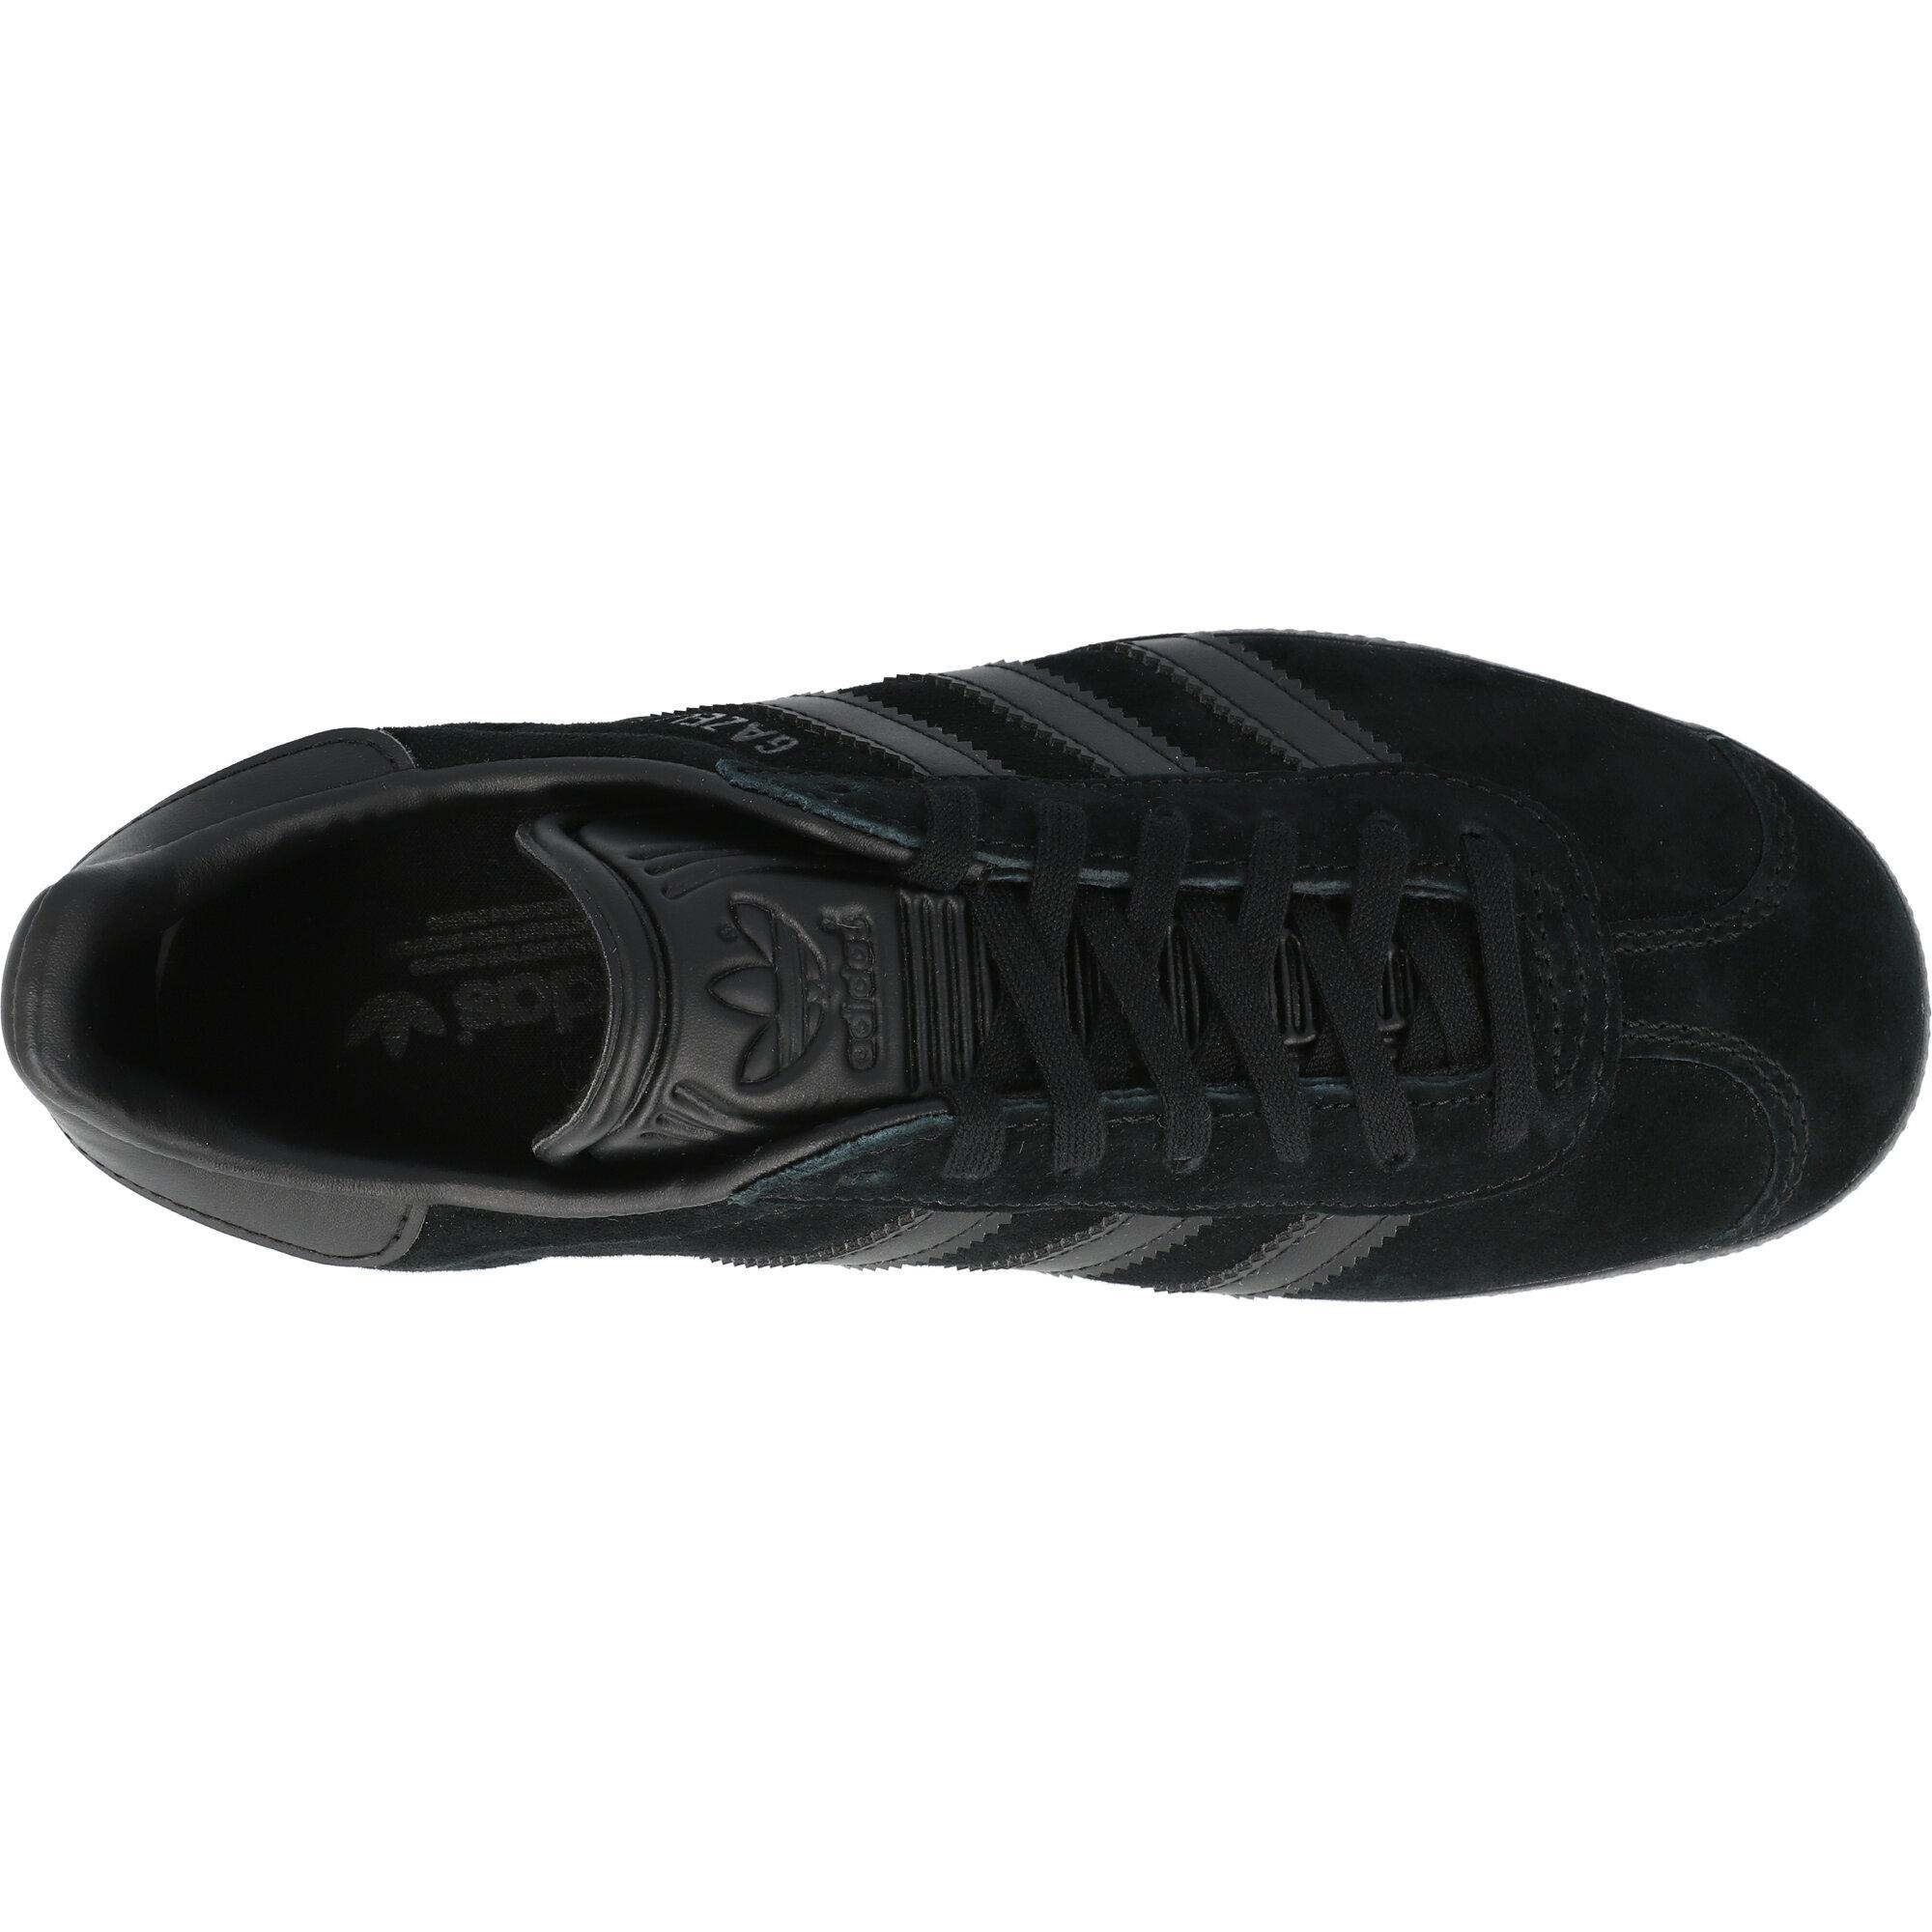 adidas Originals Gazelle Core Black Leather